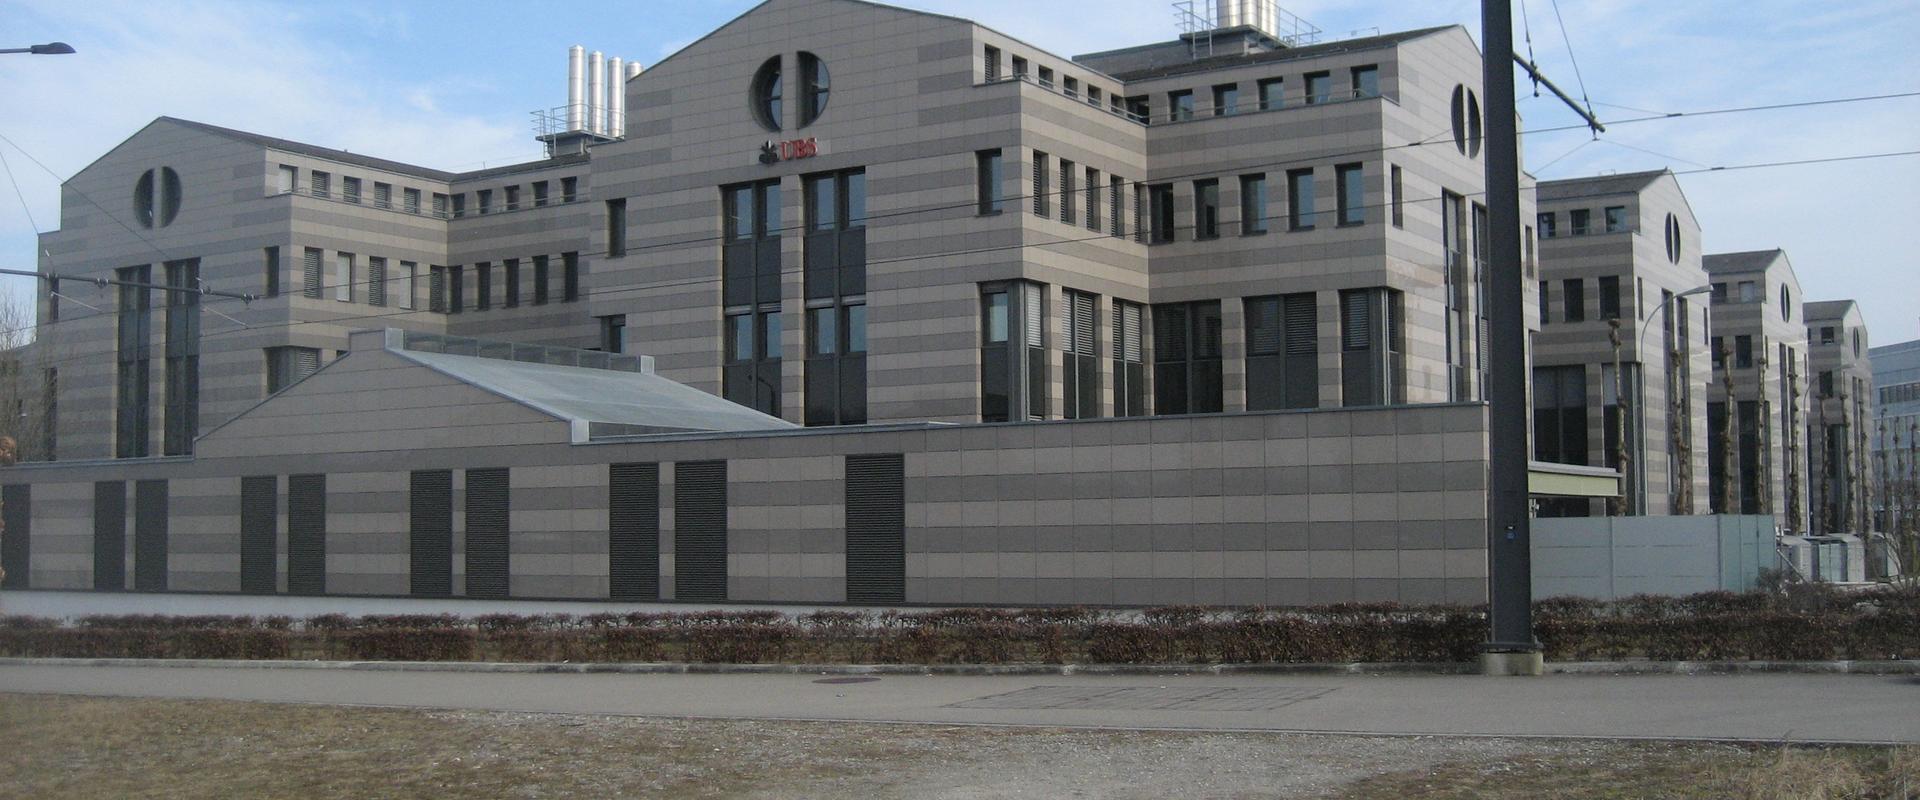 Ubs investment bank glattbrugg  // grafasasos gq